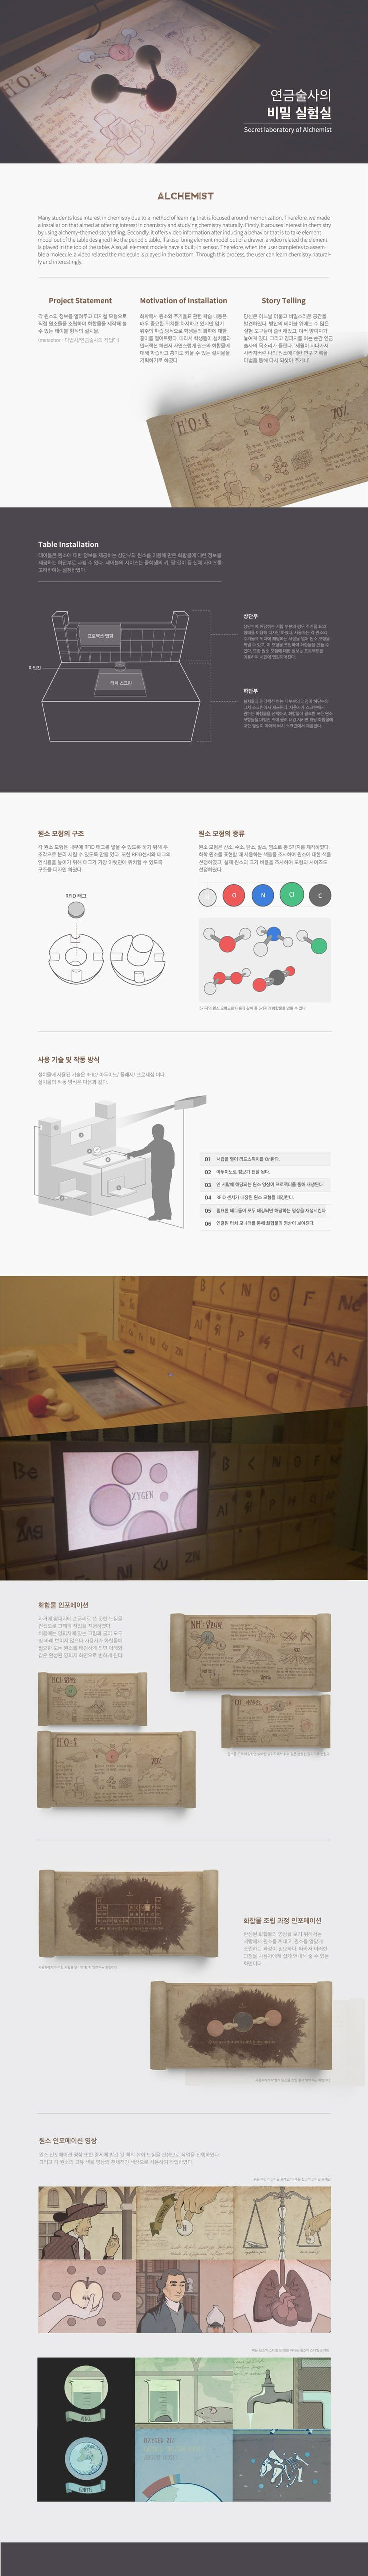 kim han sol, chae hye su, kim jin ju : 연금술사의 비밀 실험실 | Major in Digital Media Design | #hicoda | hicoda.hongik.ac.kr